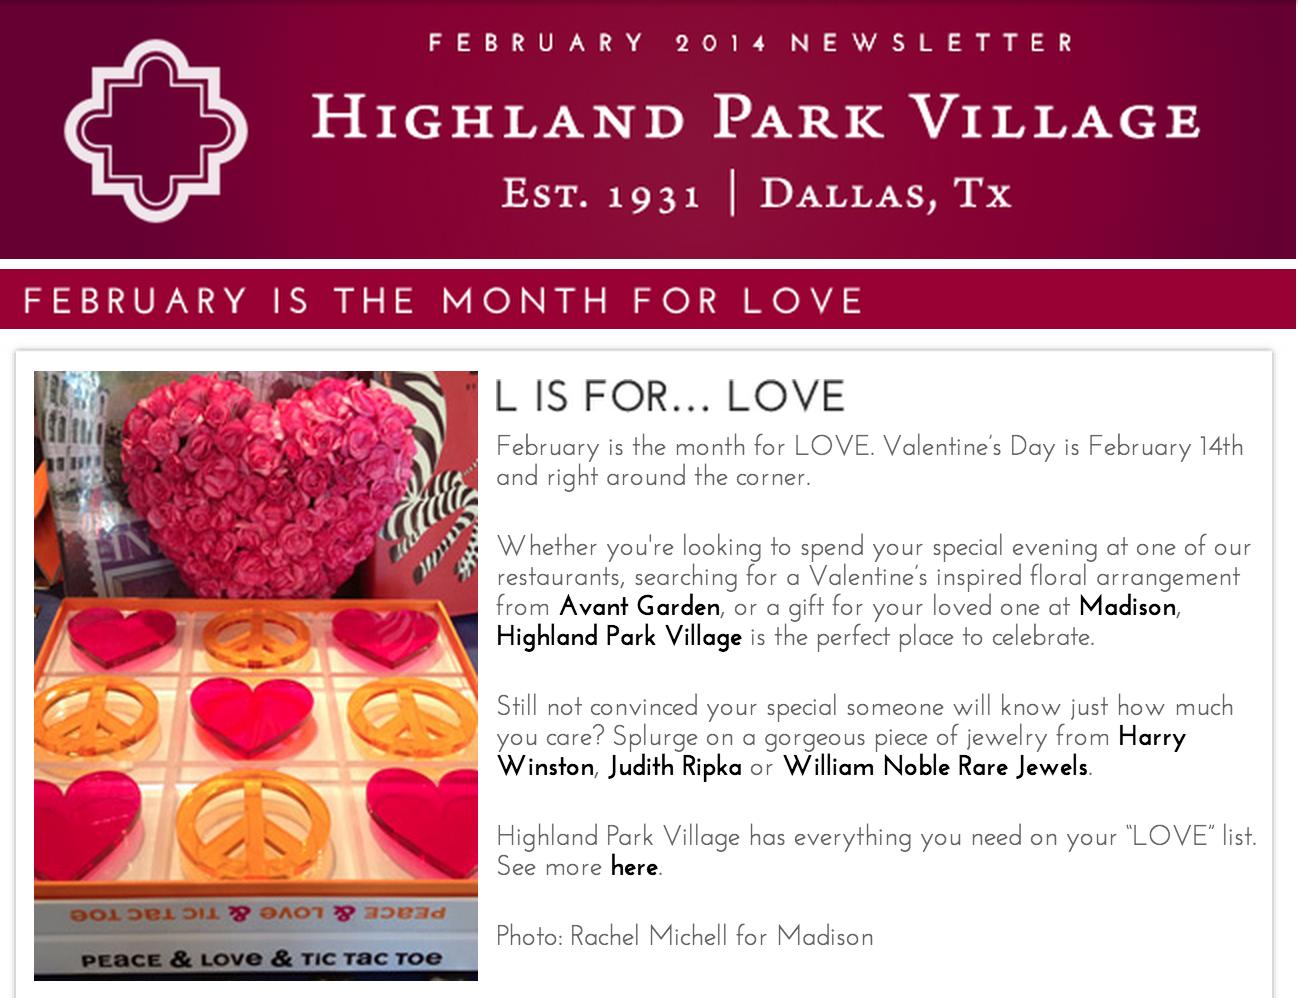 The February 2014 Highland Park Village Newsletter Highland Park